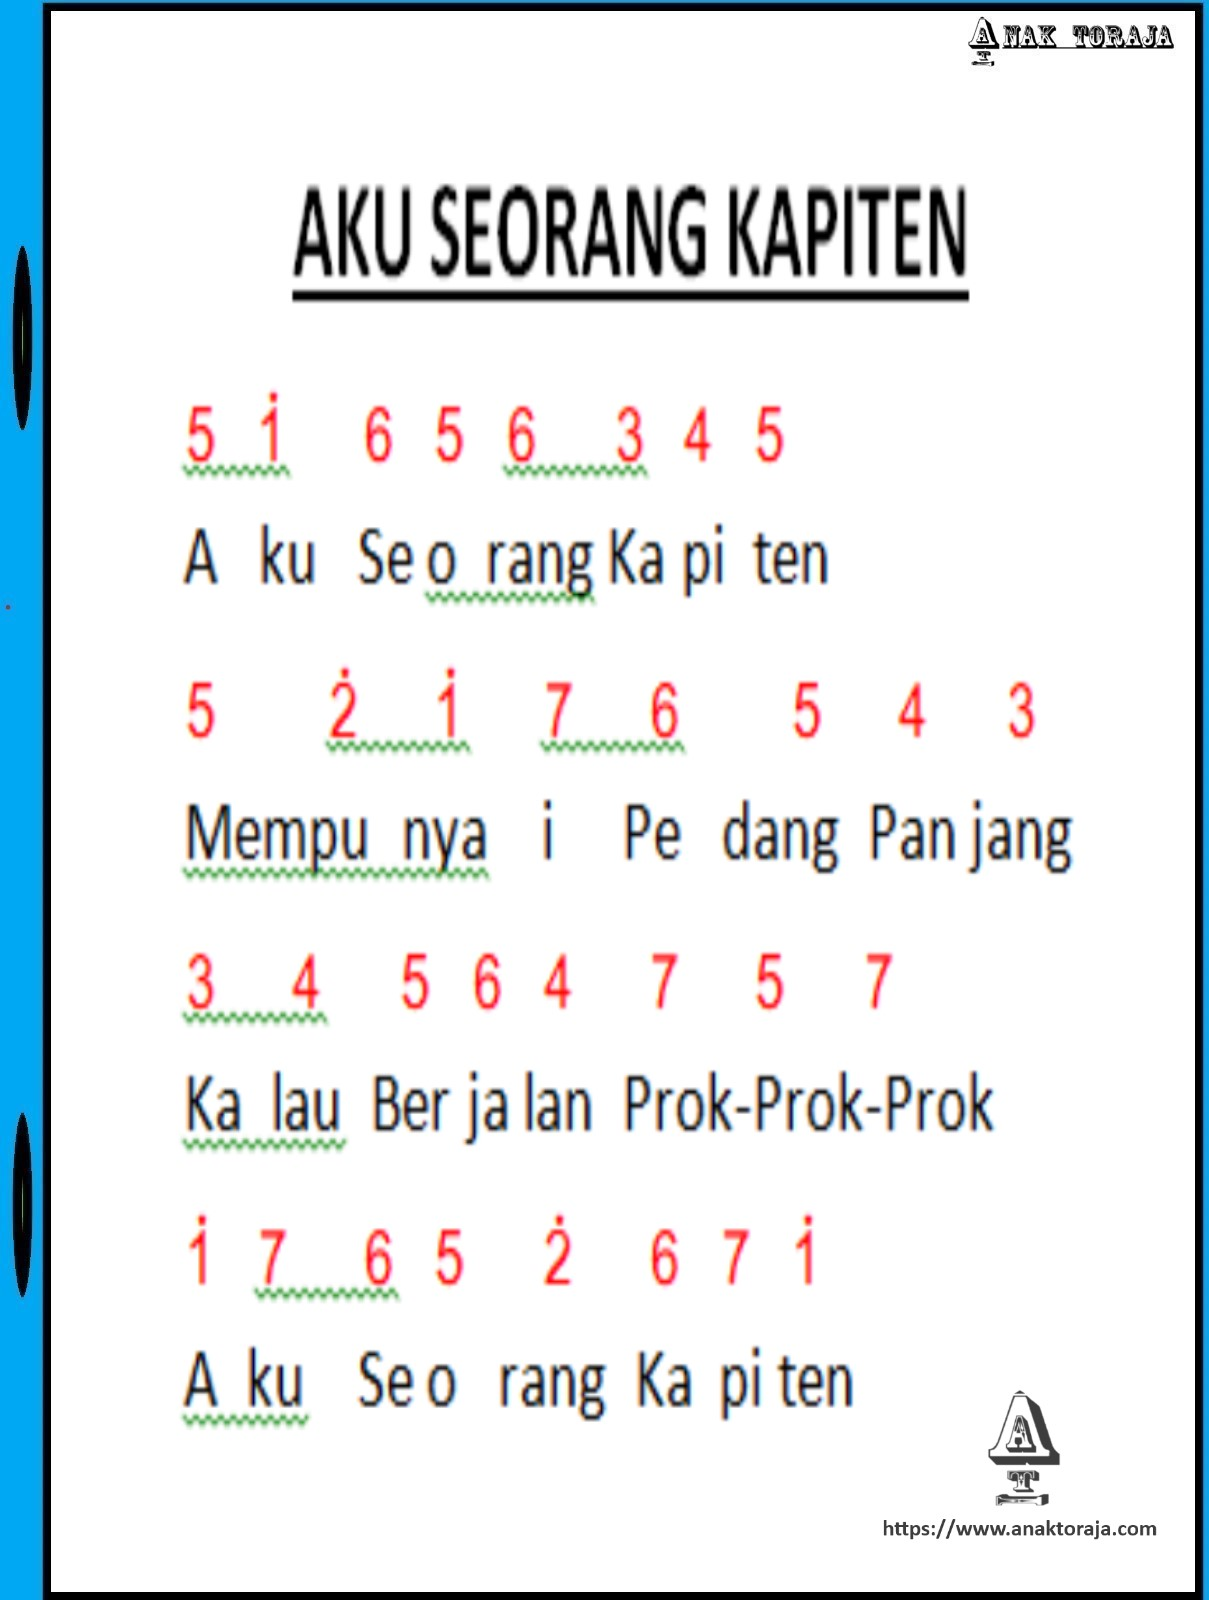 Lagu Anak Anak Not Angka : angka, Angka, Seorang, Kapiten, Anak-anak